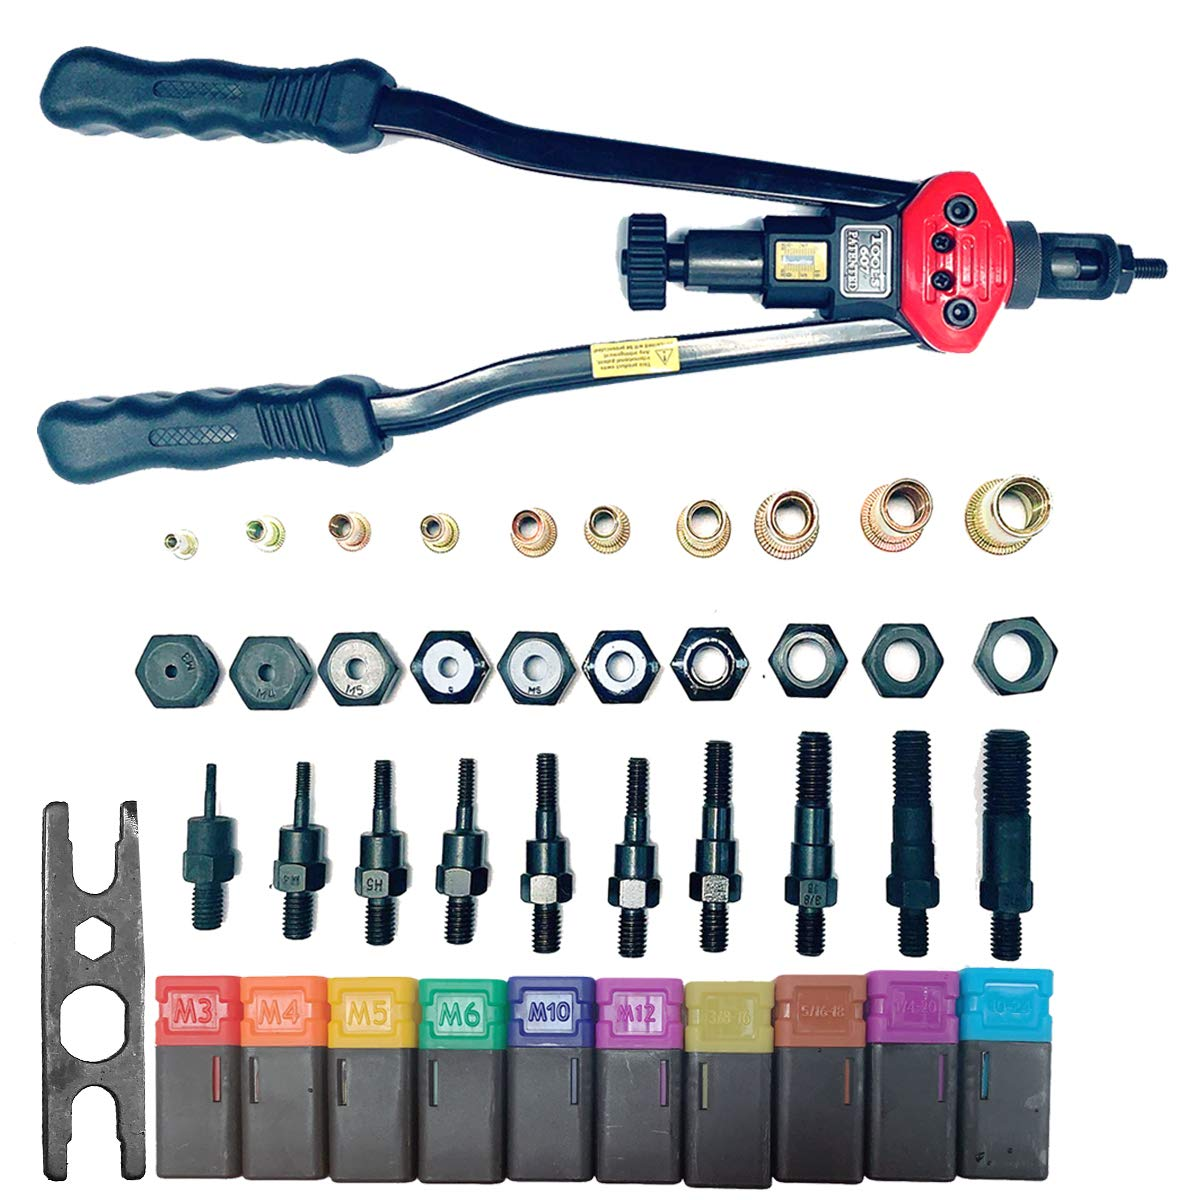 Cozyel 16'' Hand Riveter Rivet Gun Professional Installation kit Including 11 Interchangeable Mandrel (M3 M4 M5 M6 M8 M10 M12 SAE 10-24, 1/4-20, 5/16-18, 3/8-16) with 110 PCS Rivets Nuts by Cozyel